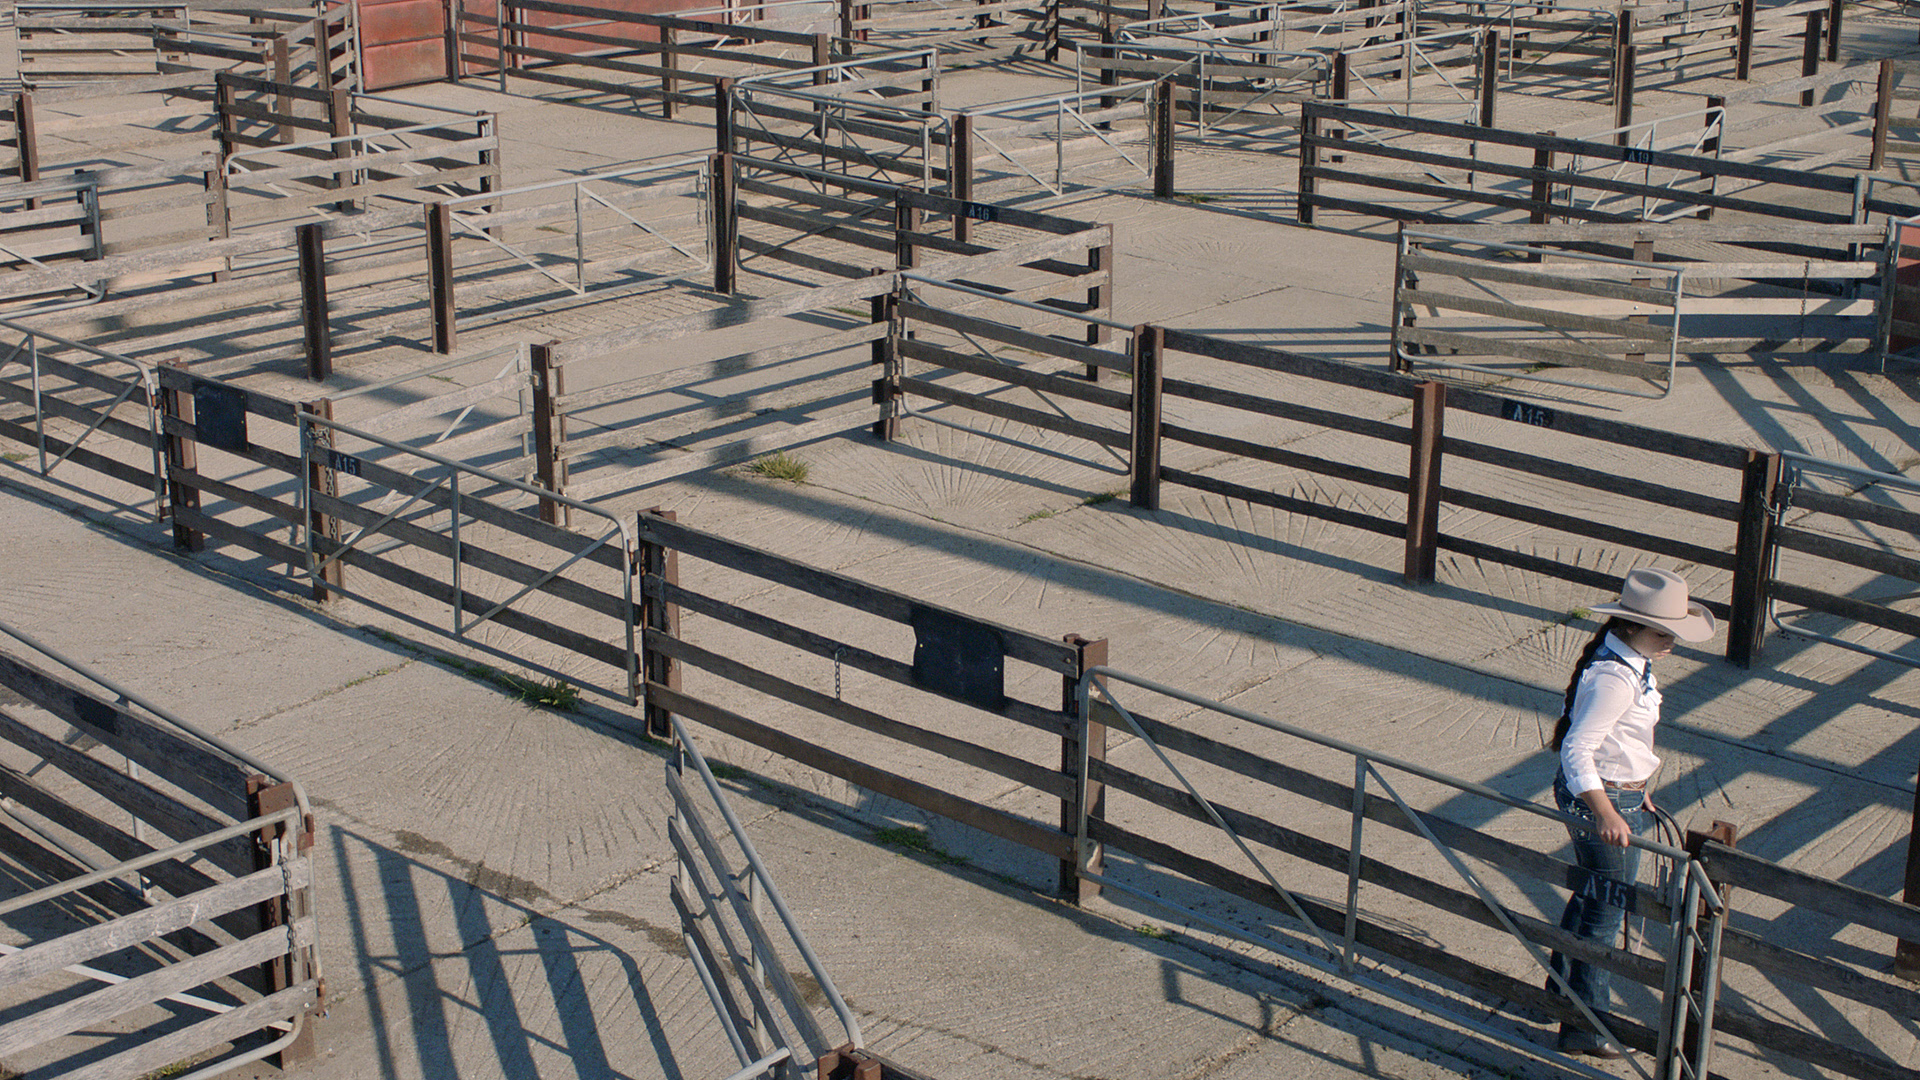 Zanny Begg,  The Bullwhip Effect  (still), 2017, 6m